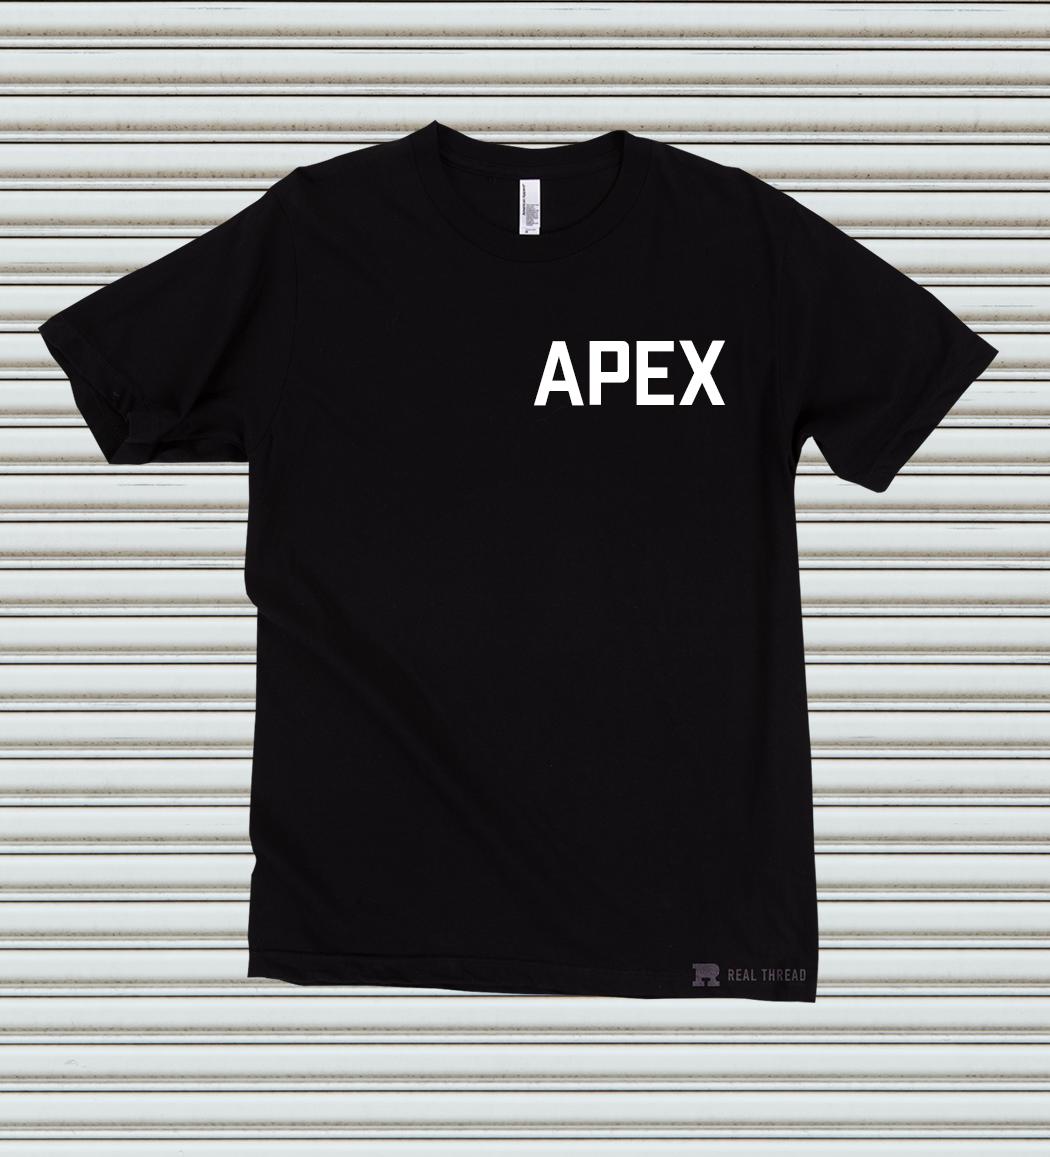 14d3a9a0a0 Best Fonts for T-Shirts | 20 Free T-Shirt Font Downloads